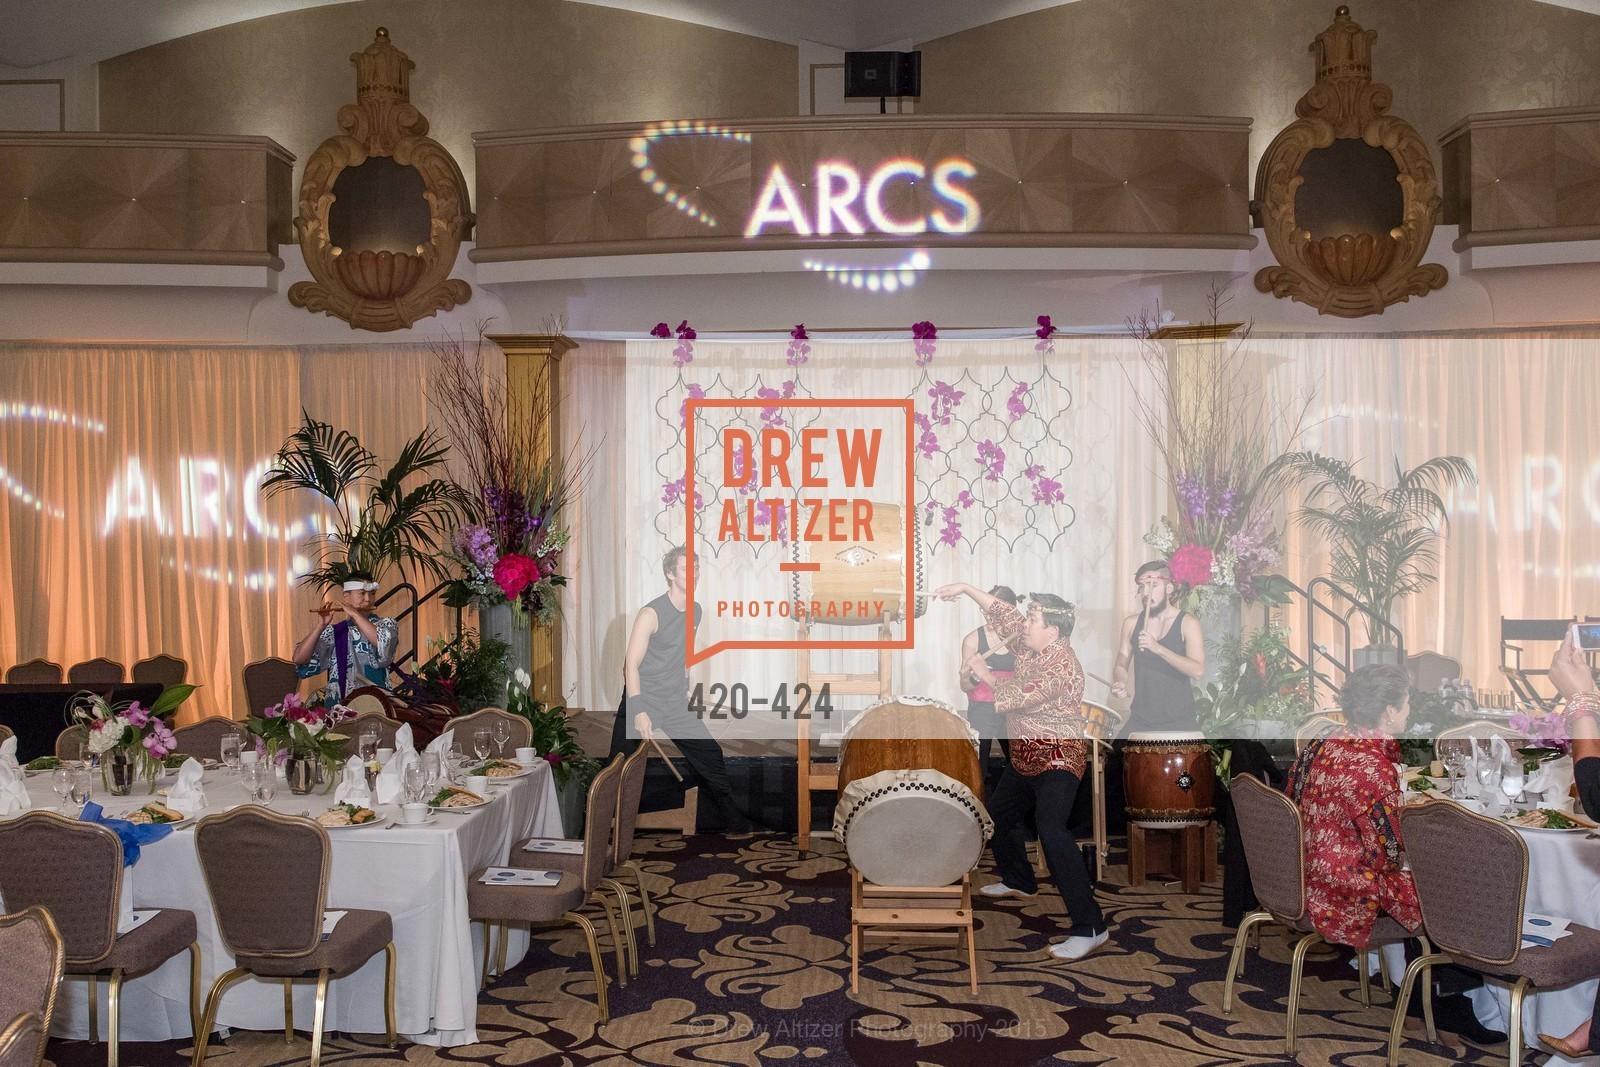 Performance, 2015 ARCS Foundation Scholar Awards Luncheon, The Fairmont San Francisco. 950 Mason St, October 29th, 2015,Drew Altizer, Drew Altizer Photography, full-service agency, private events, San Francisco photographer, photographer california